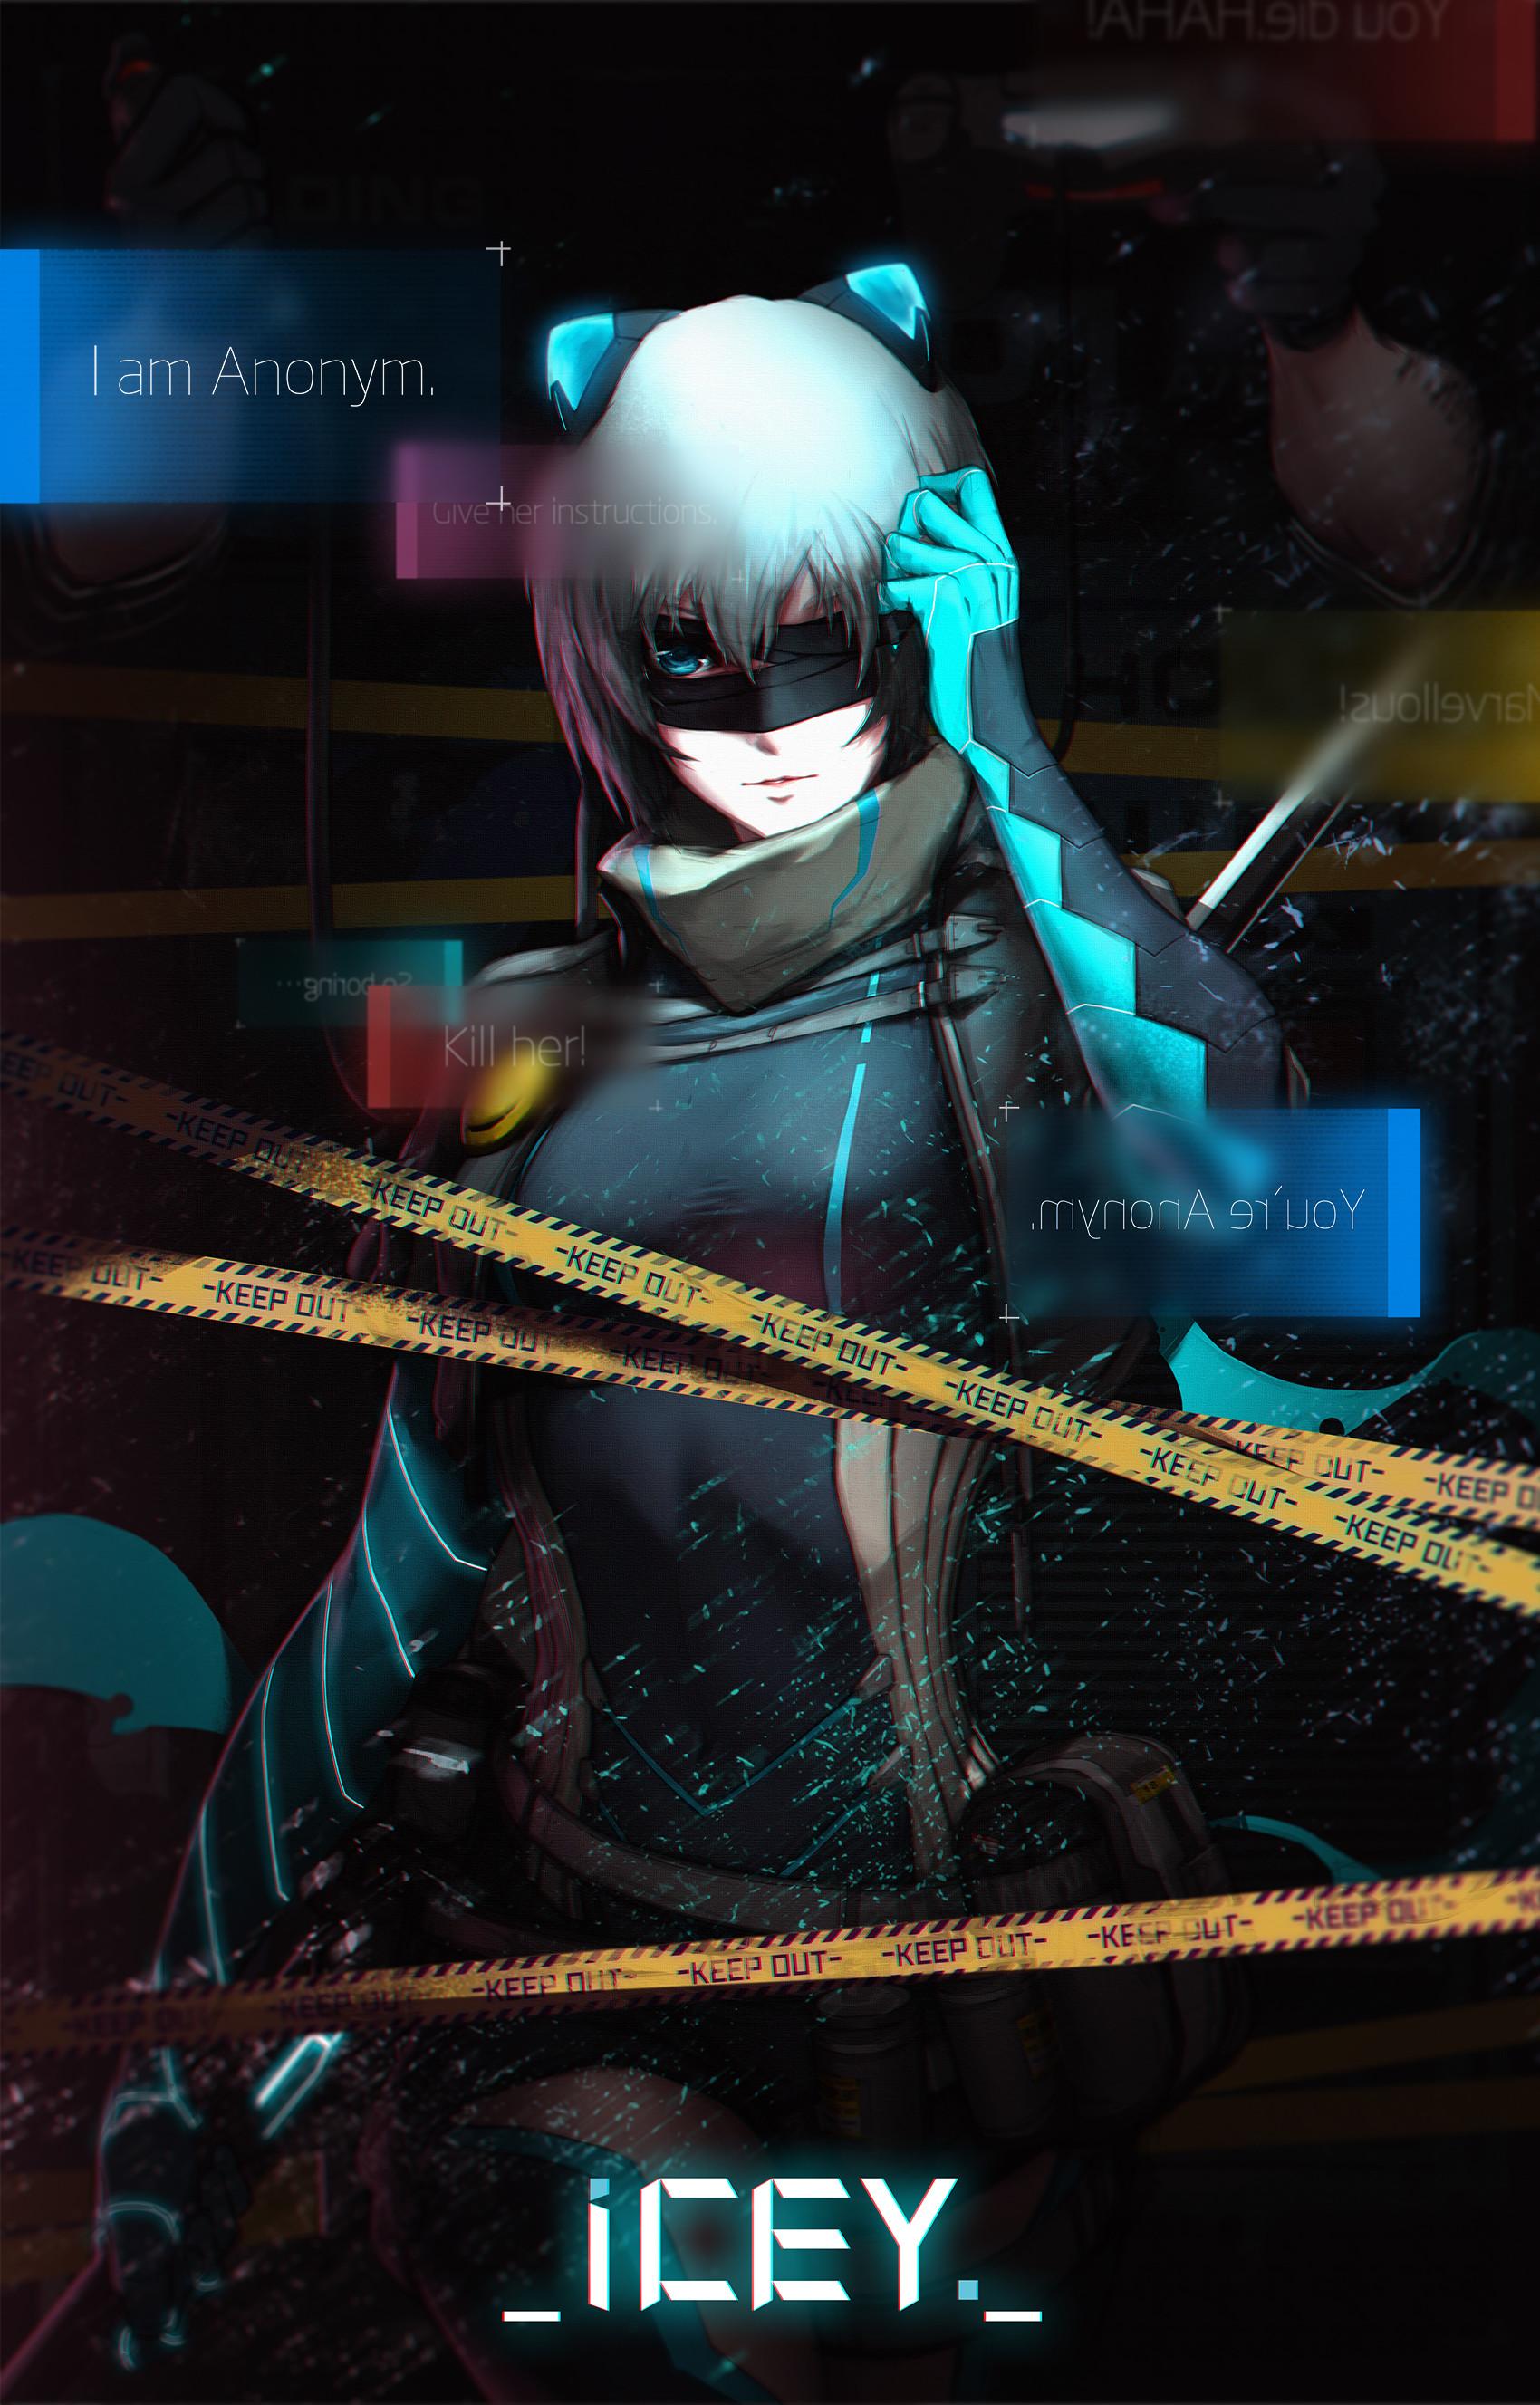 Cyberpunk Girl Wallpaper Artstation Icey(anonymous Network Tooo T